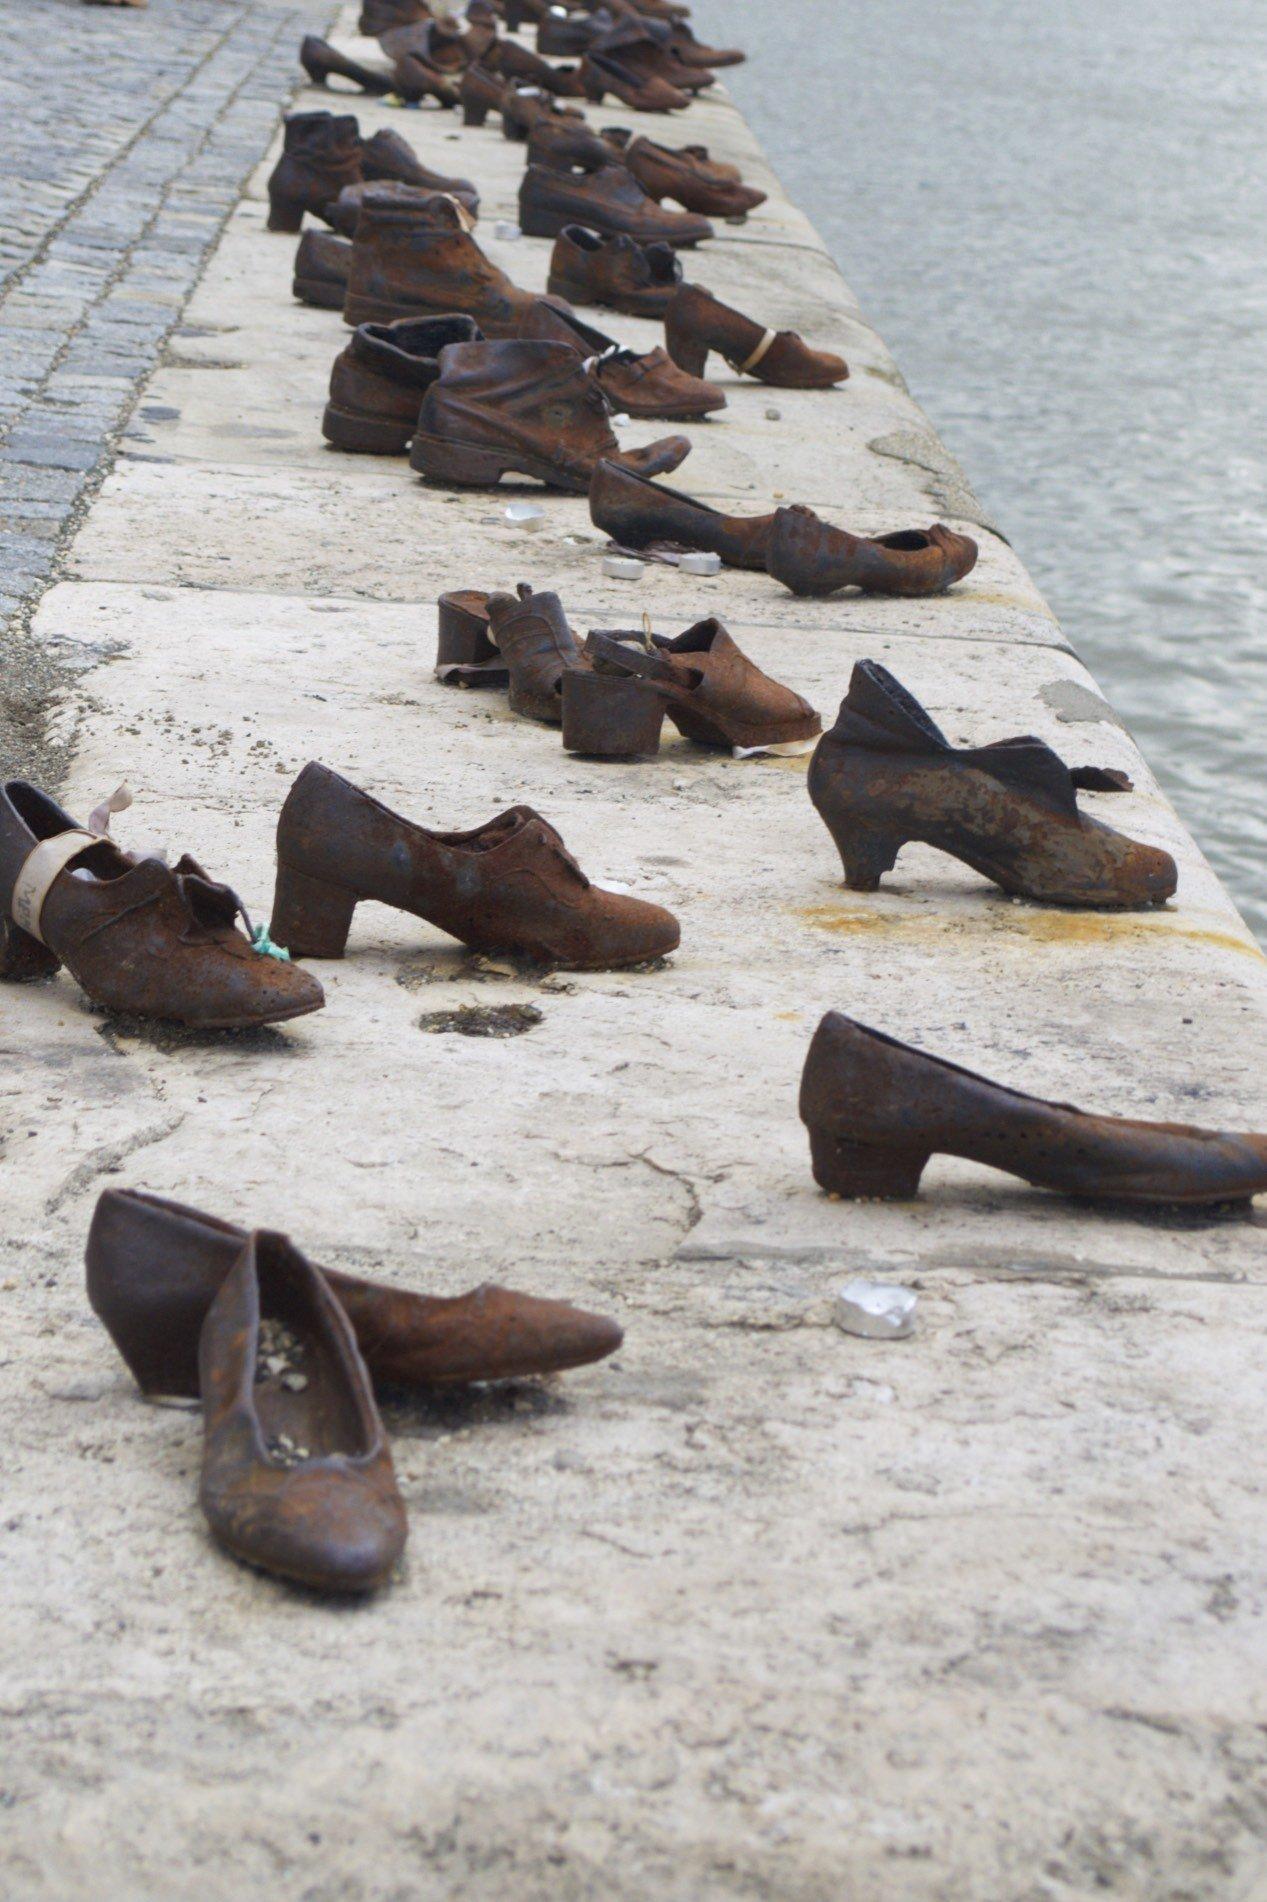 Mahnmal Schuhe am Donauufer